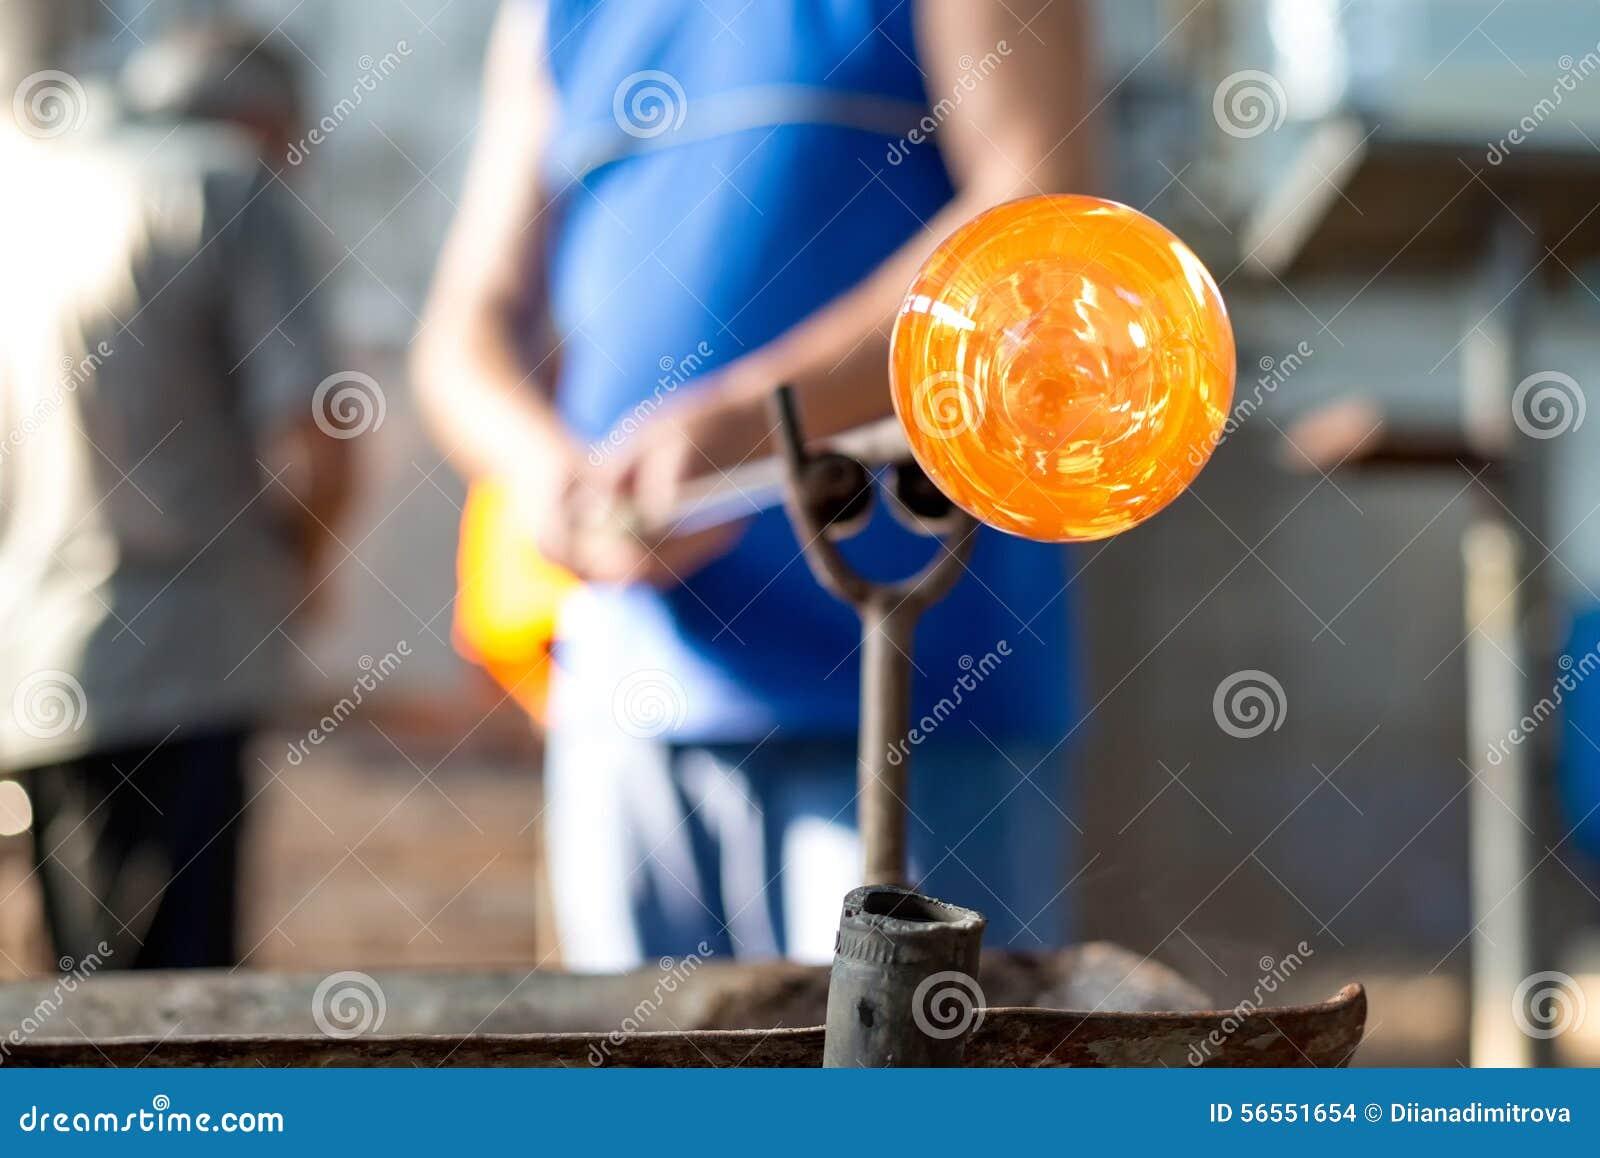 Download Χειροποίητοι αριθμοί του λειωμένου γυαλιού Στοκ Εικόνες - εικόνα από καλλιτεχνών, φλόγα: 56551654